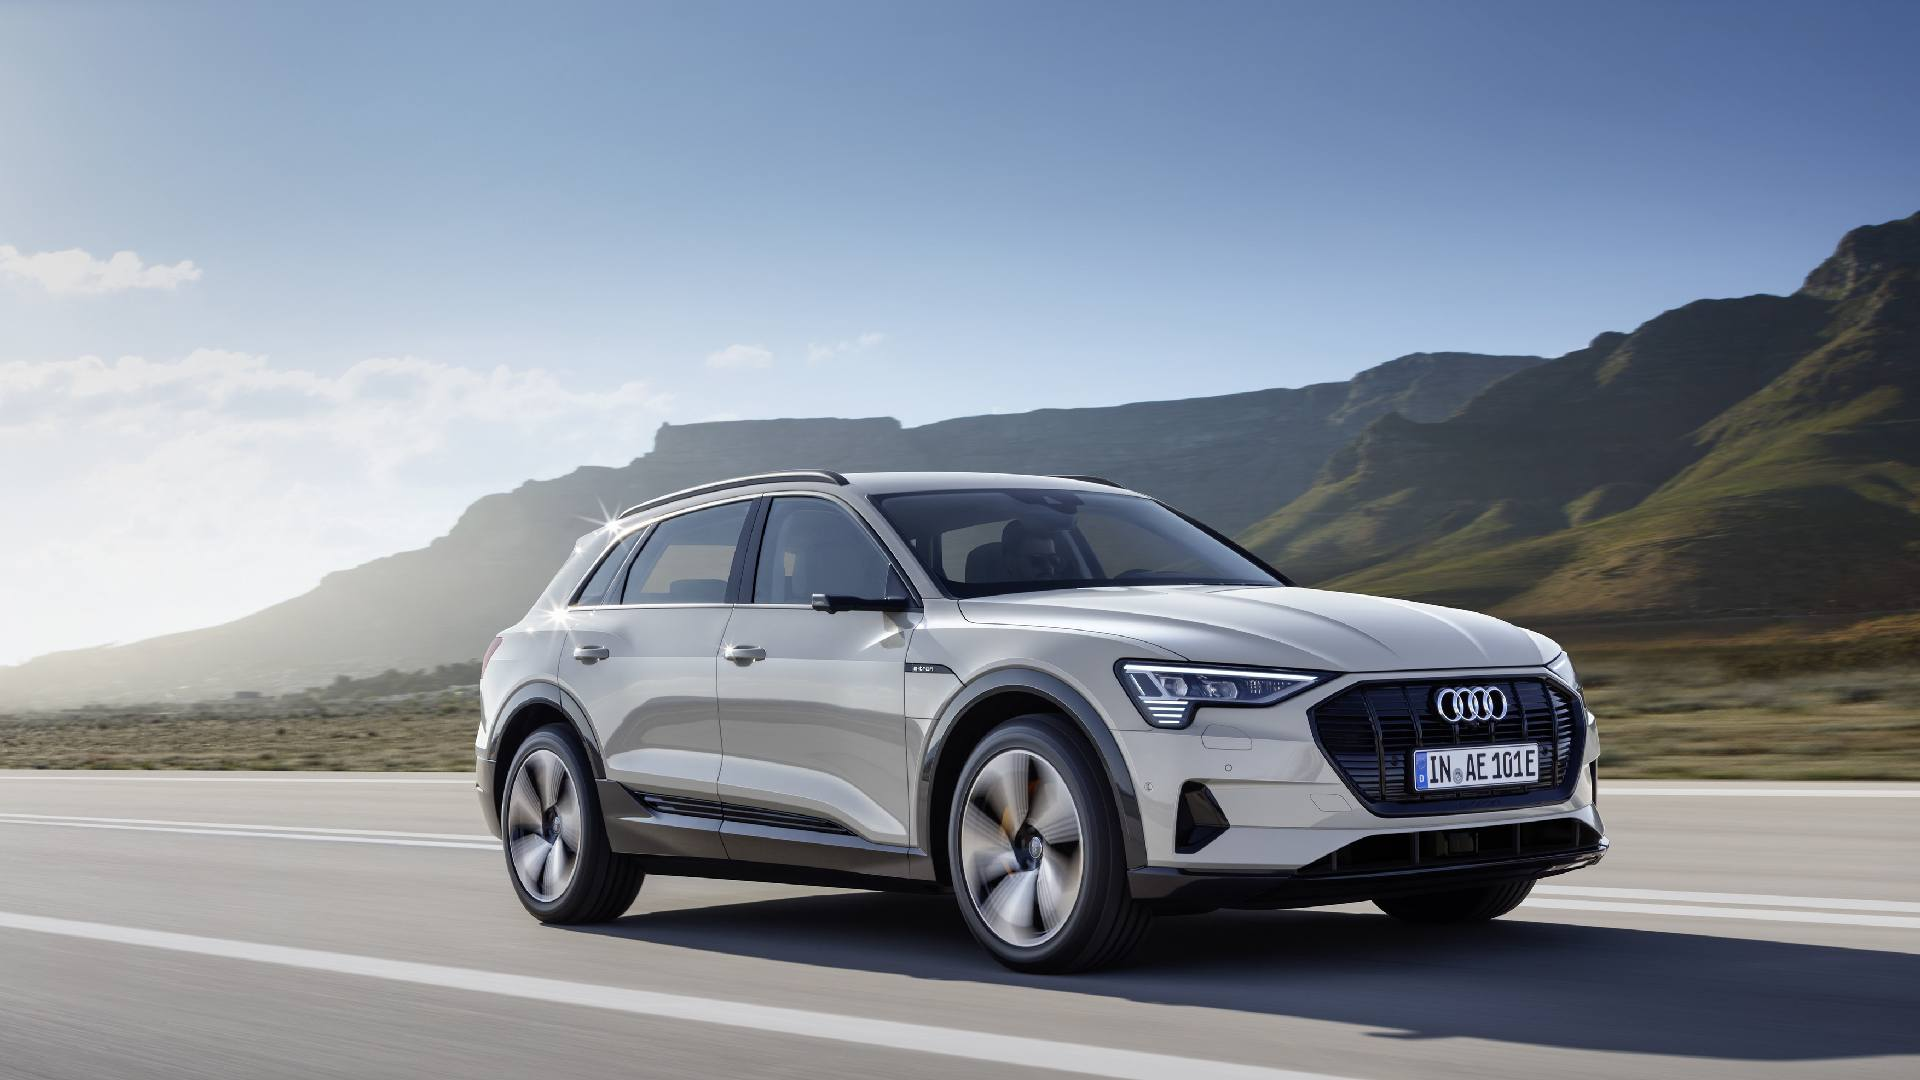 Kelebihan Suv Audi 2019 Murah Berkualitas